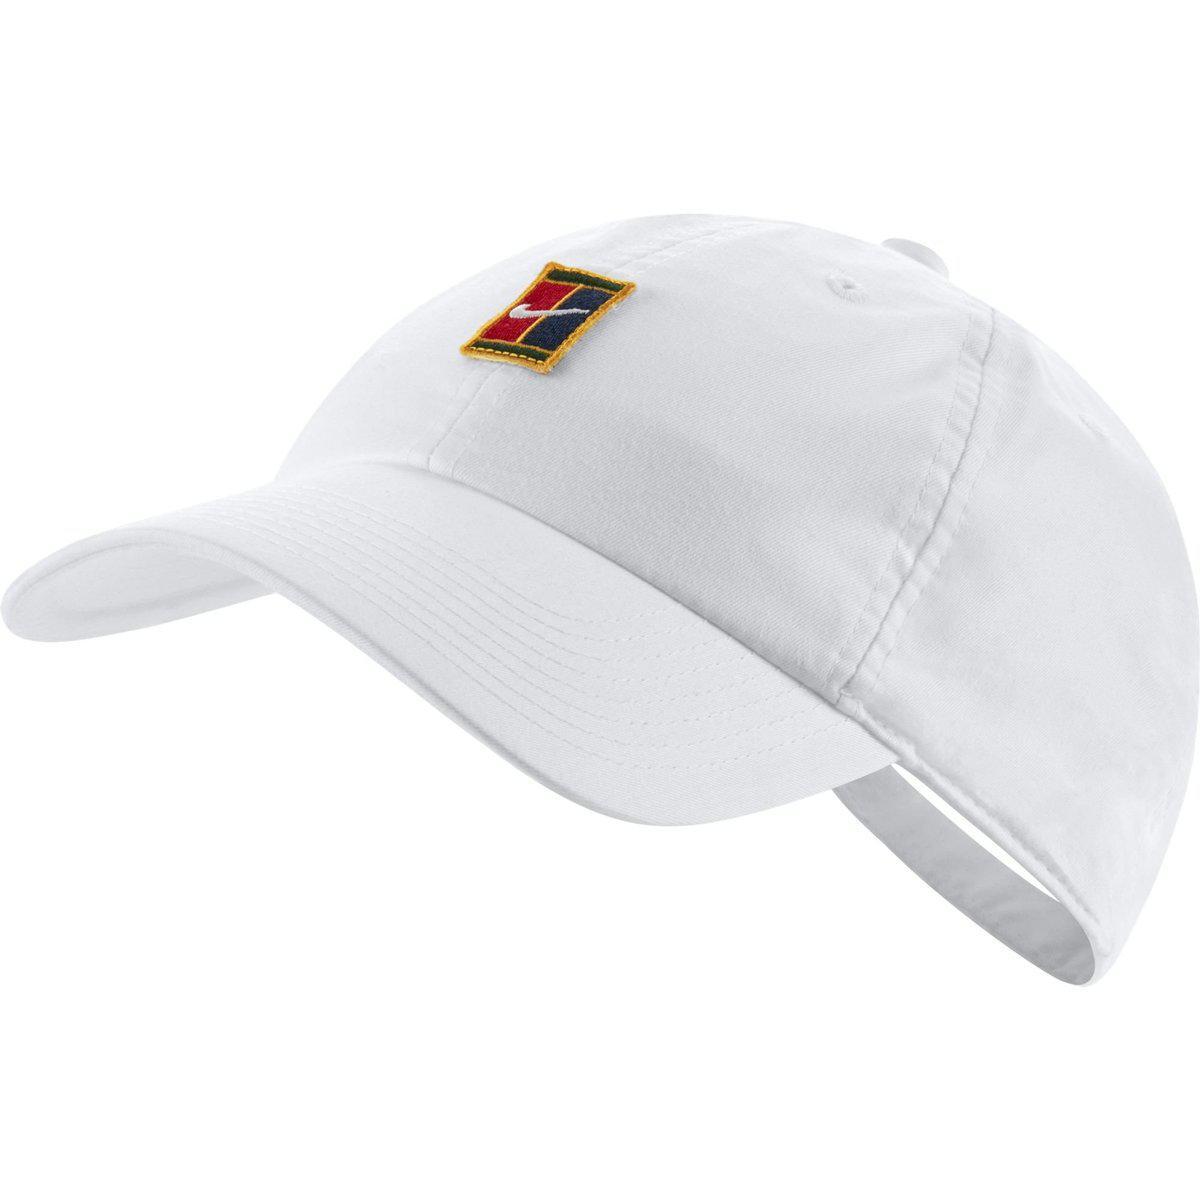 969aa2b7e89 Lyst - Nike Heritage 86 Tennis Cap in White for Men